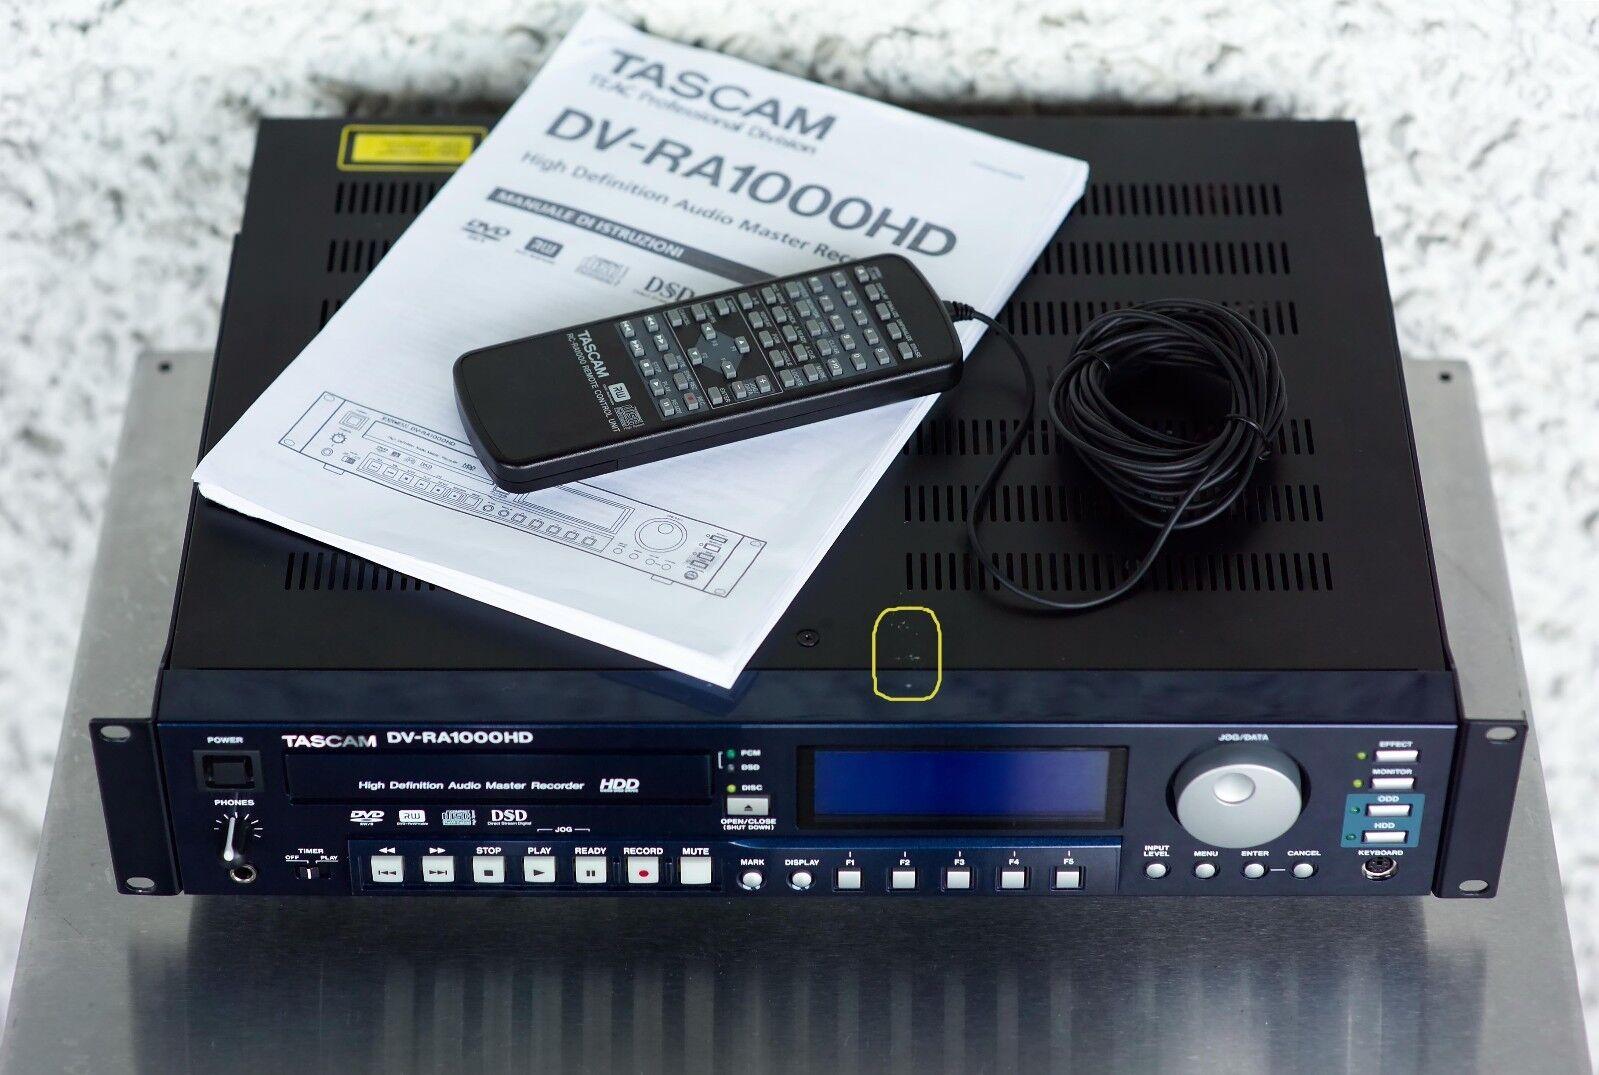 CD recorder registratore professionale TASCAM DV-RA1000HD DVD hi Resolution DSD